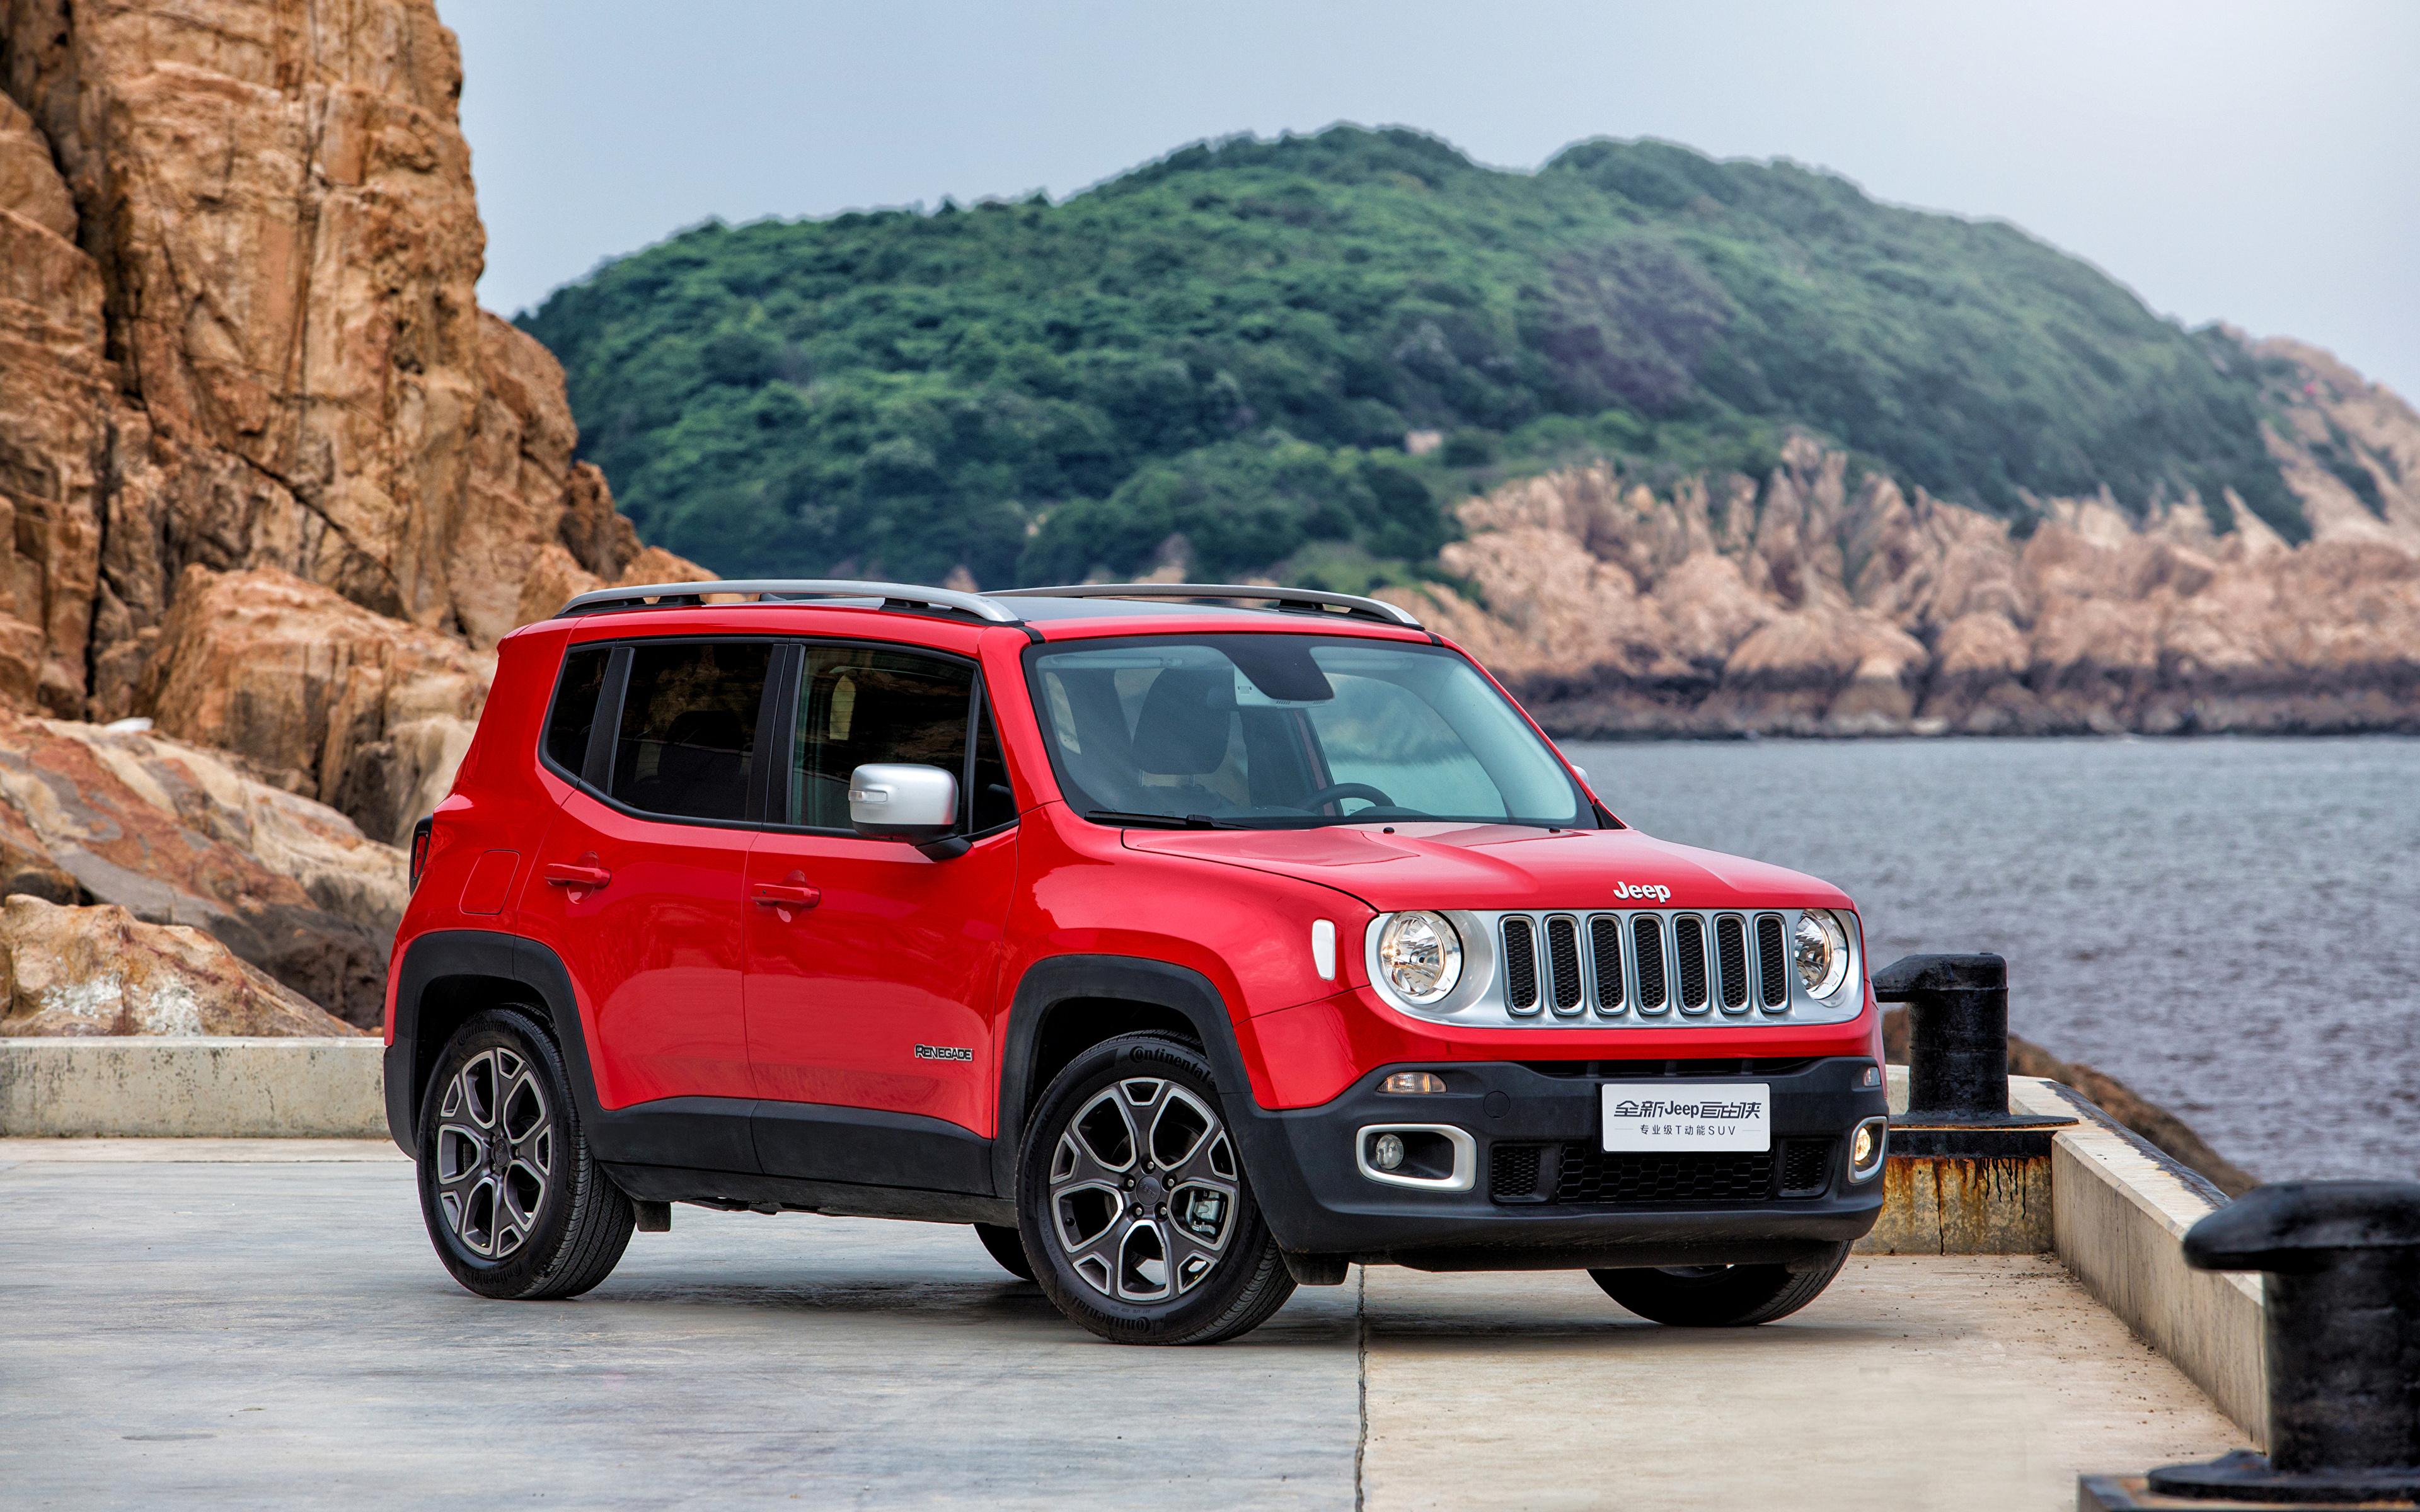 красный автомобиль джип ford sport trac red car jeep  № 3085906 без смс